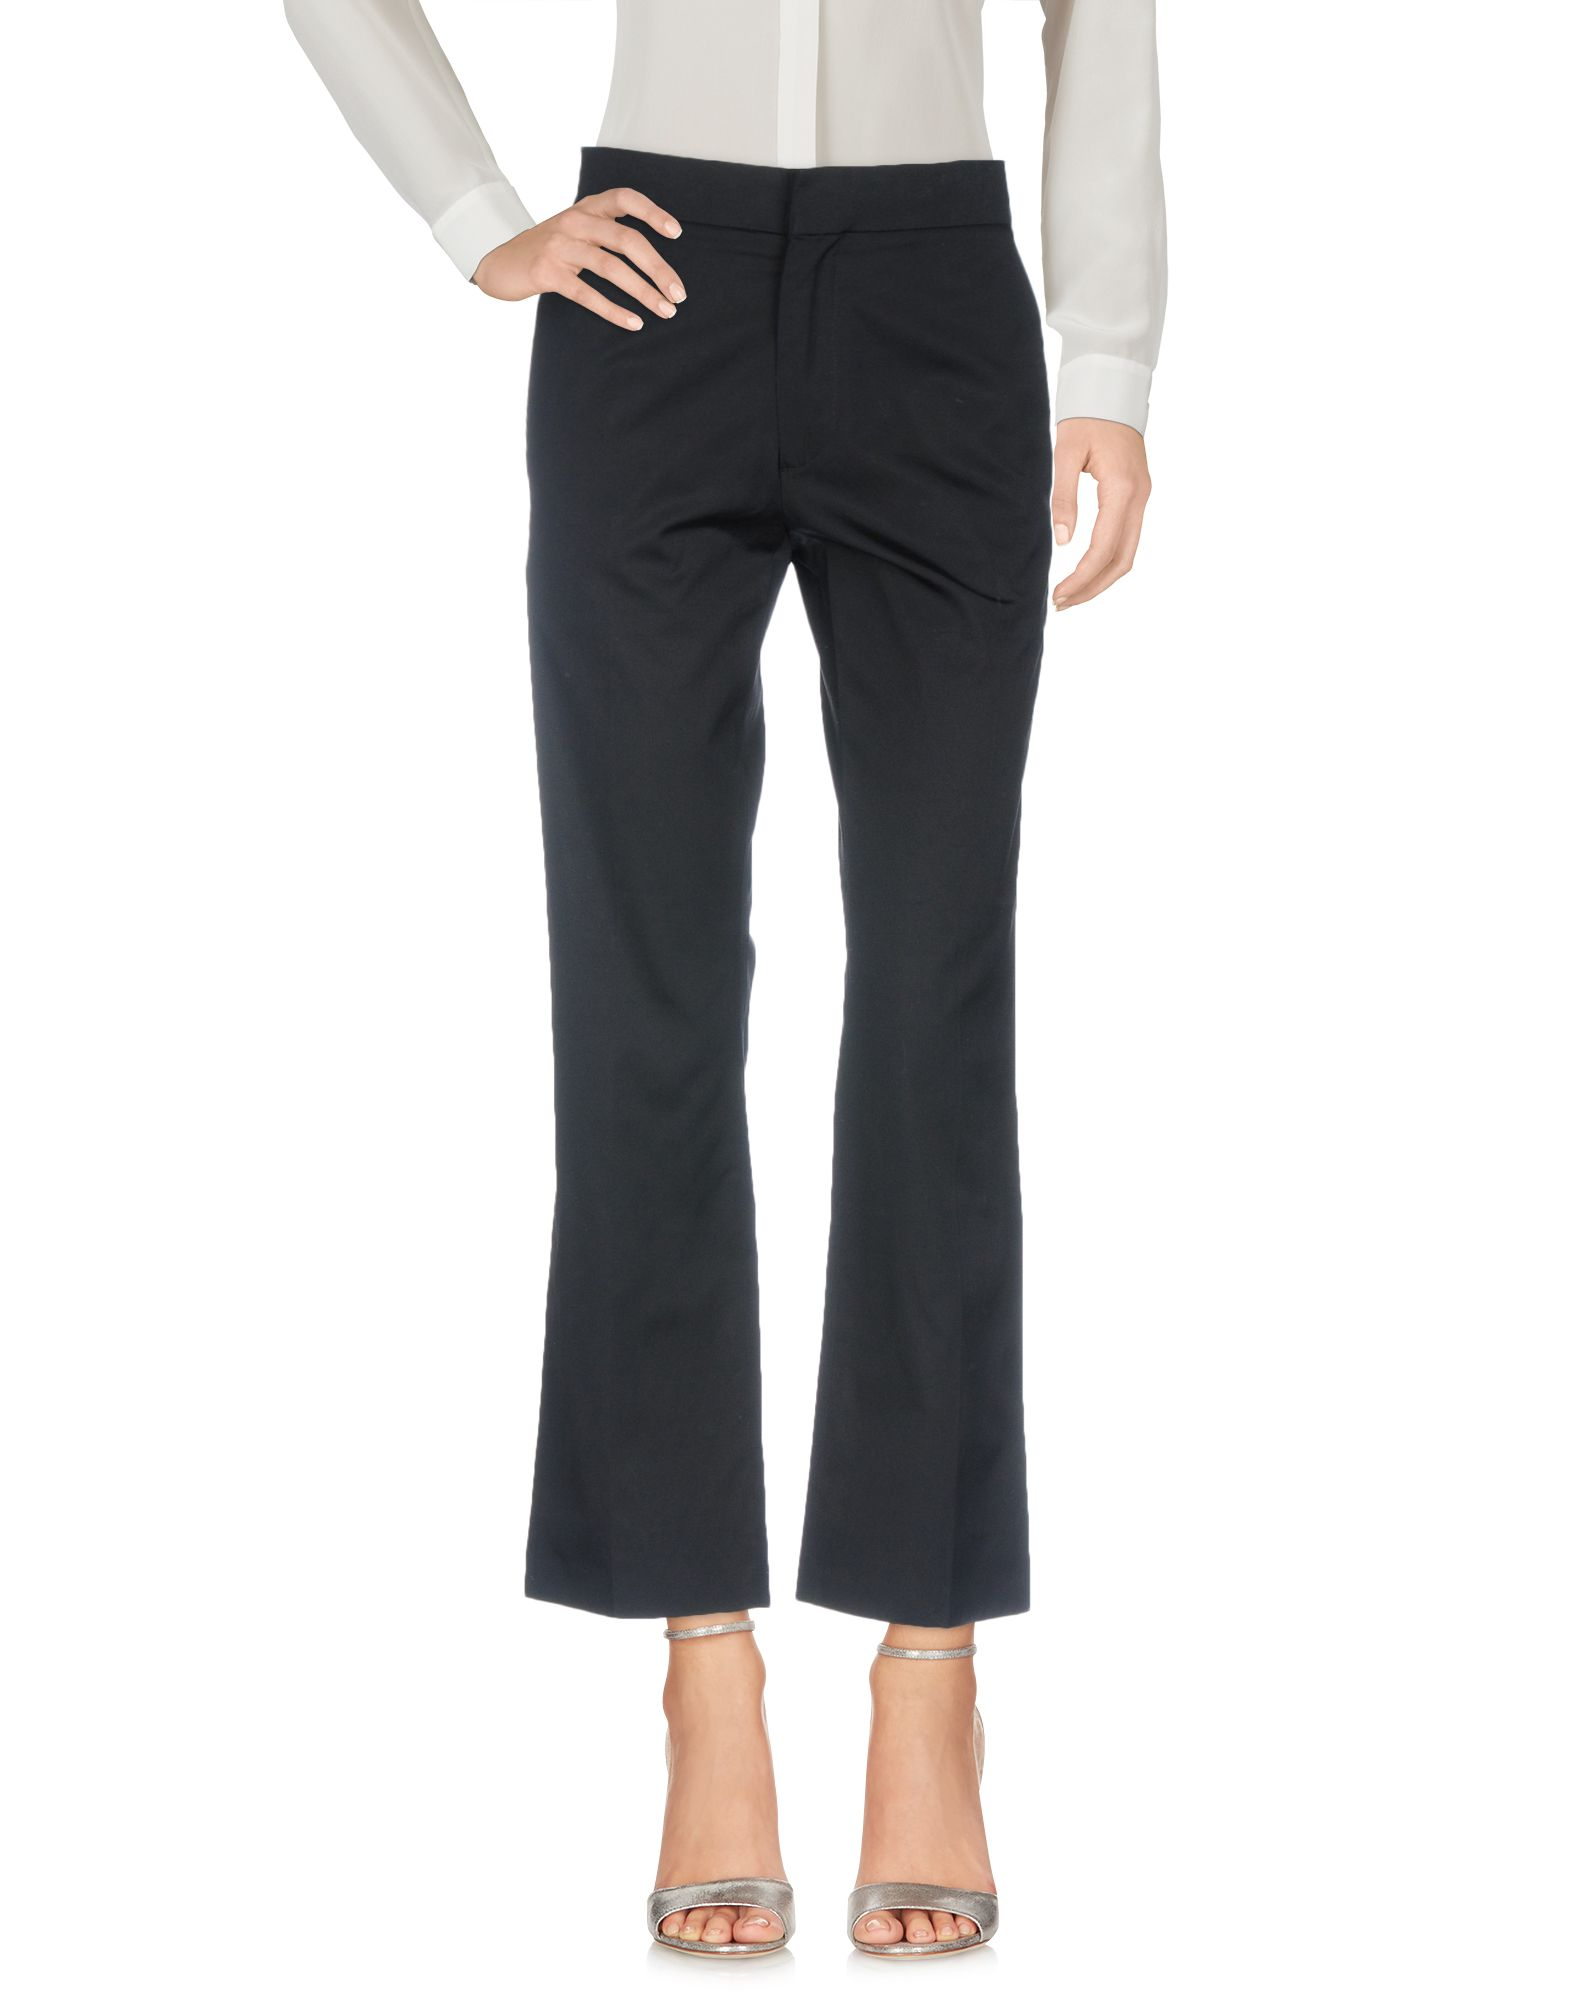 Pantalone Marni Donna - Acquista online su KRudKbzuh